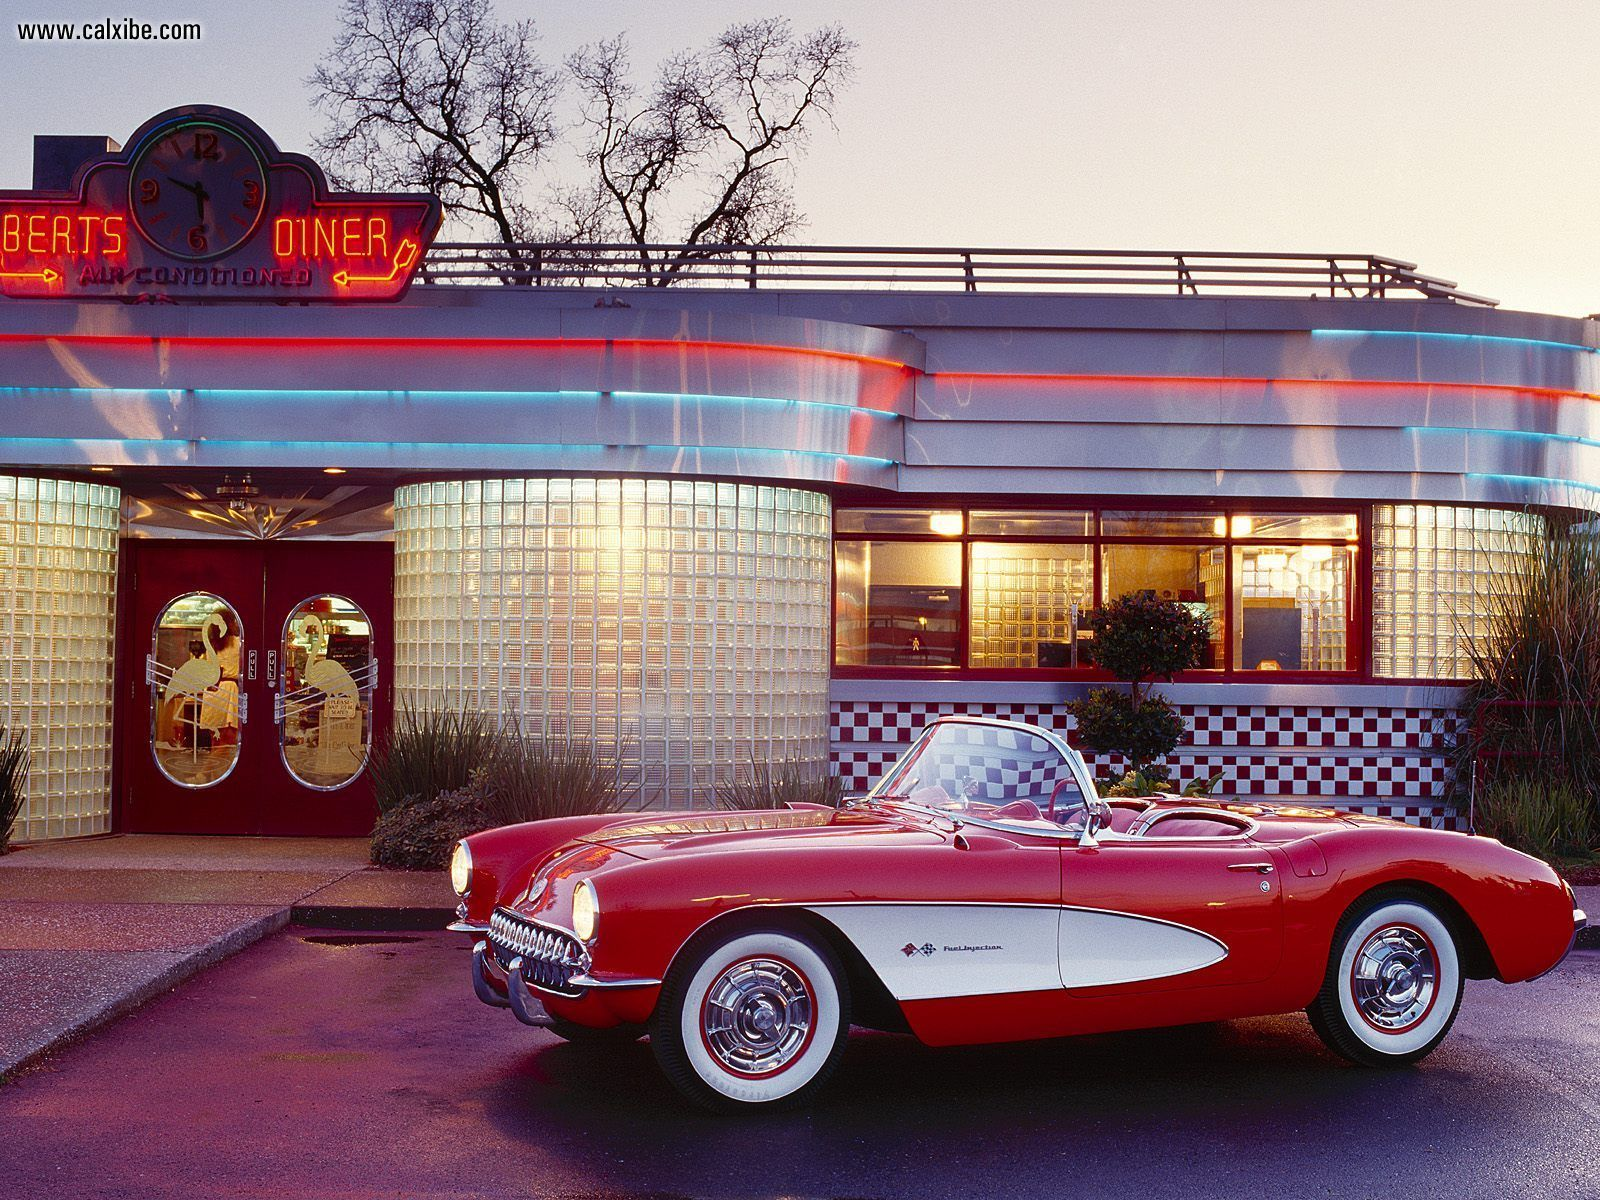 1957 Chevrolet Corvette Convertible-1-